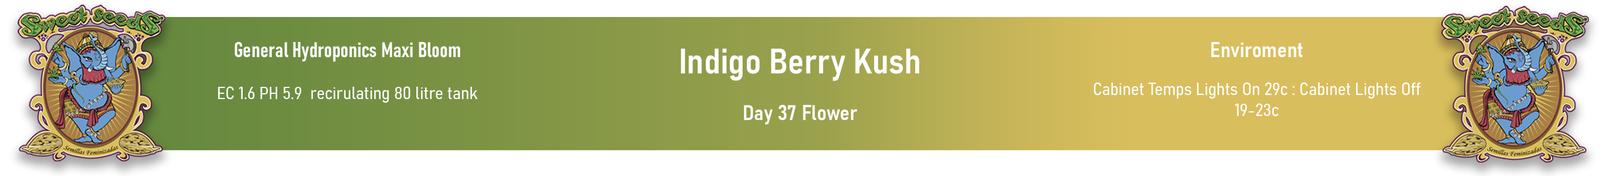 large.60293de58b919_SweetSeeds-IndigoBerryKush-Day37Flower-InfoPanel-14-02-2021.jpg